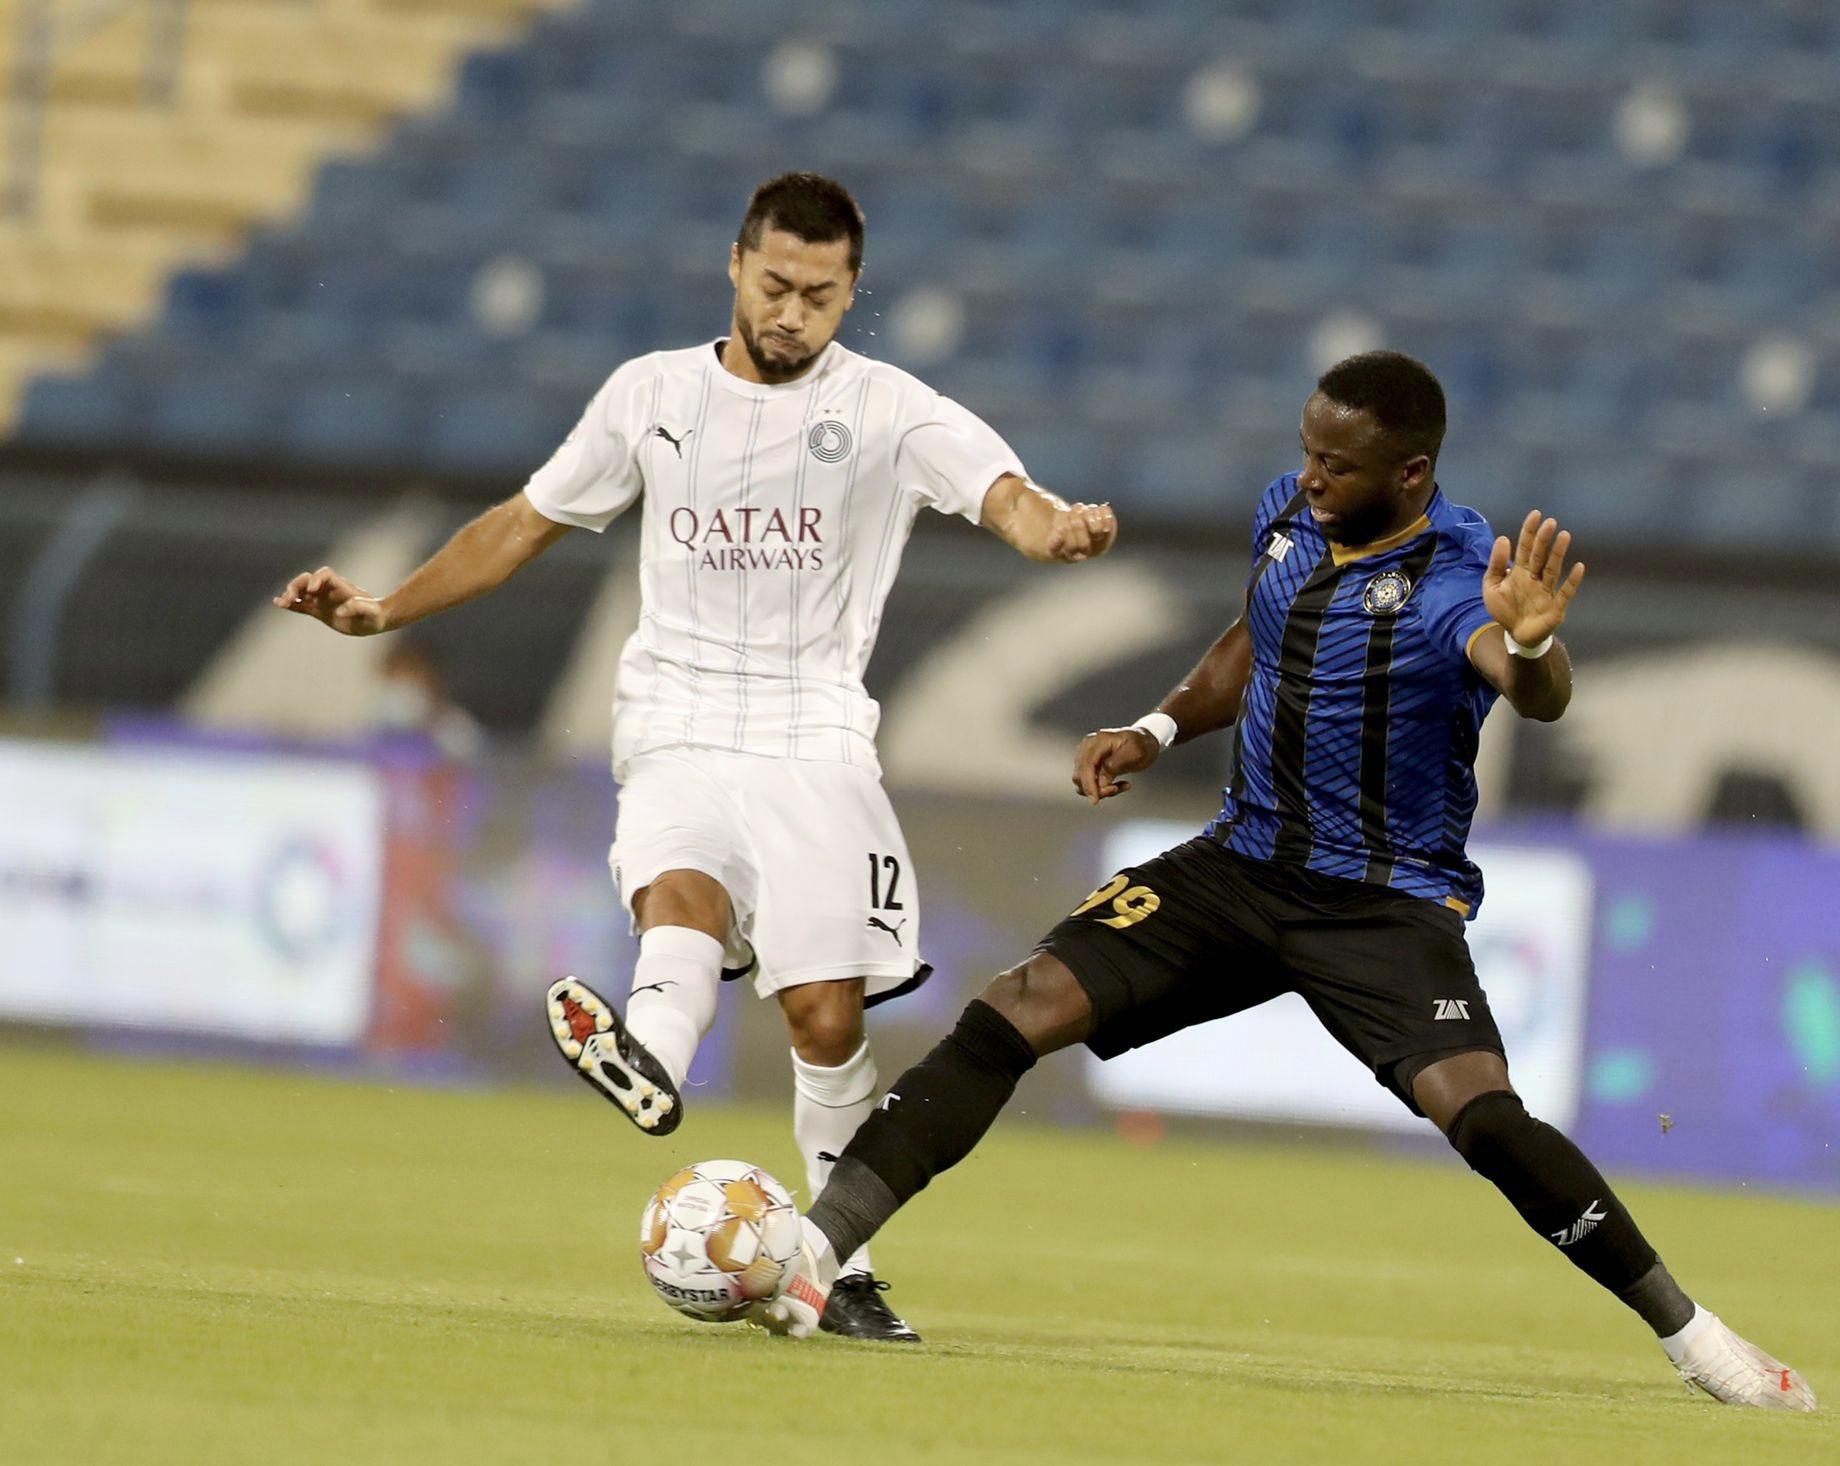 QNB Stars League: Al Sadd 2-0 Al Sailiya